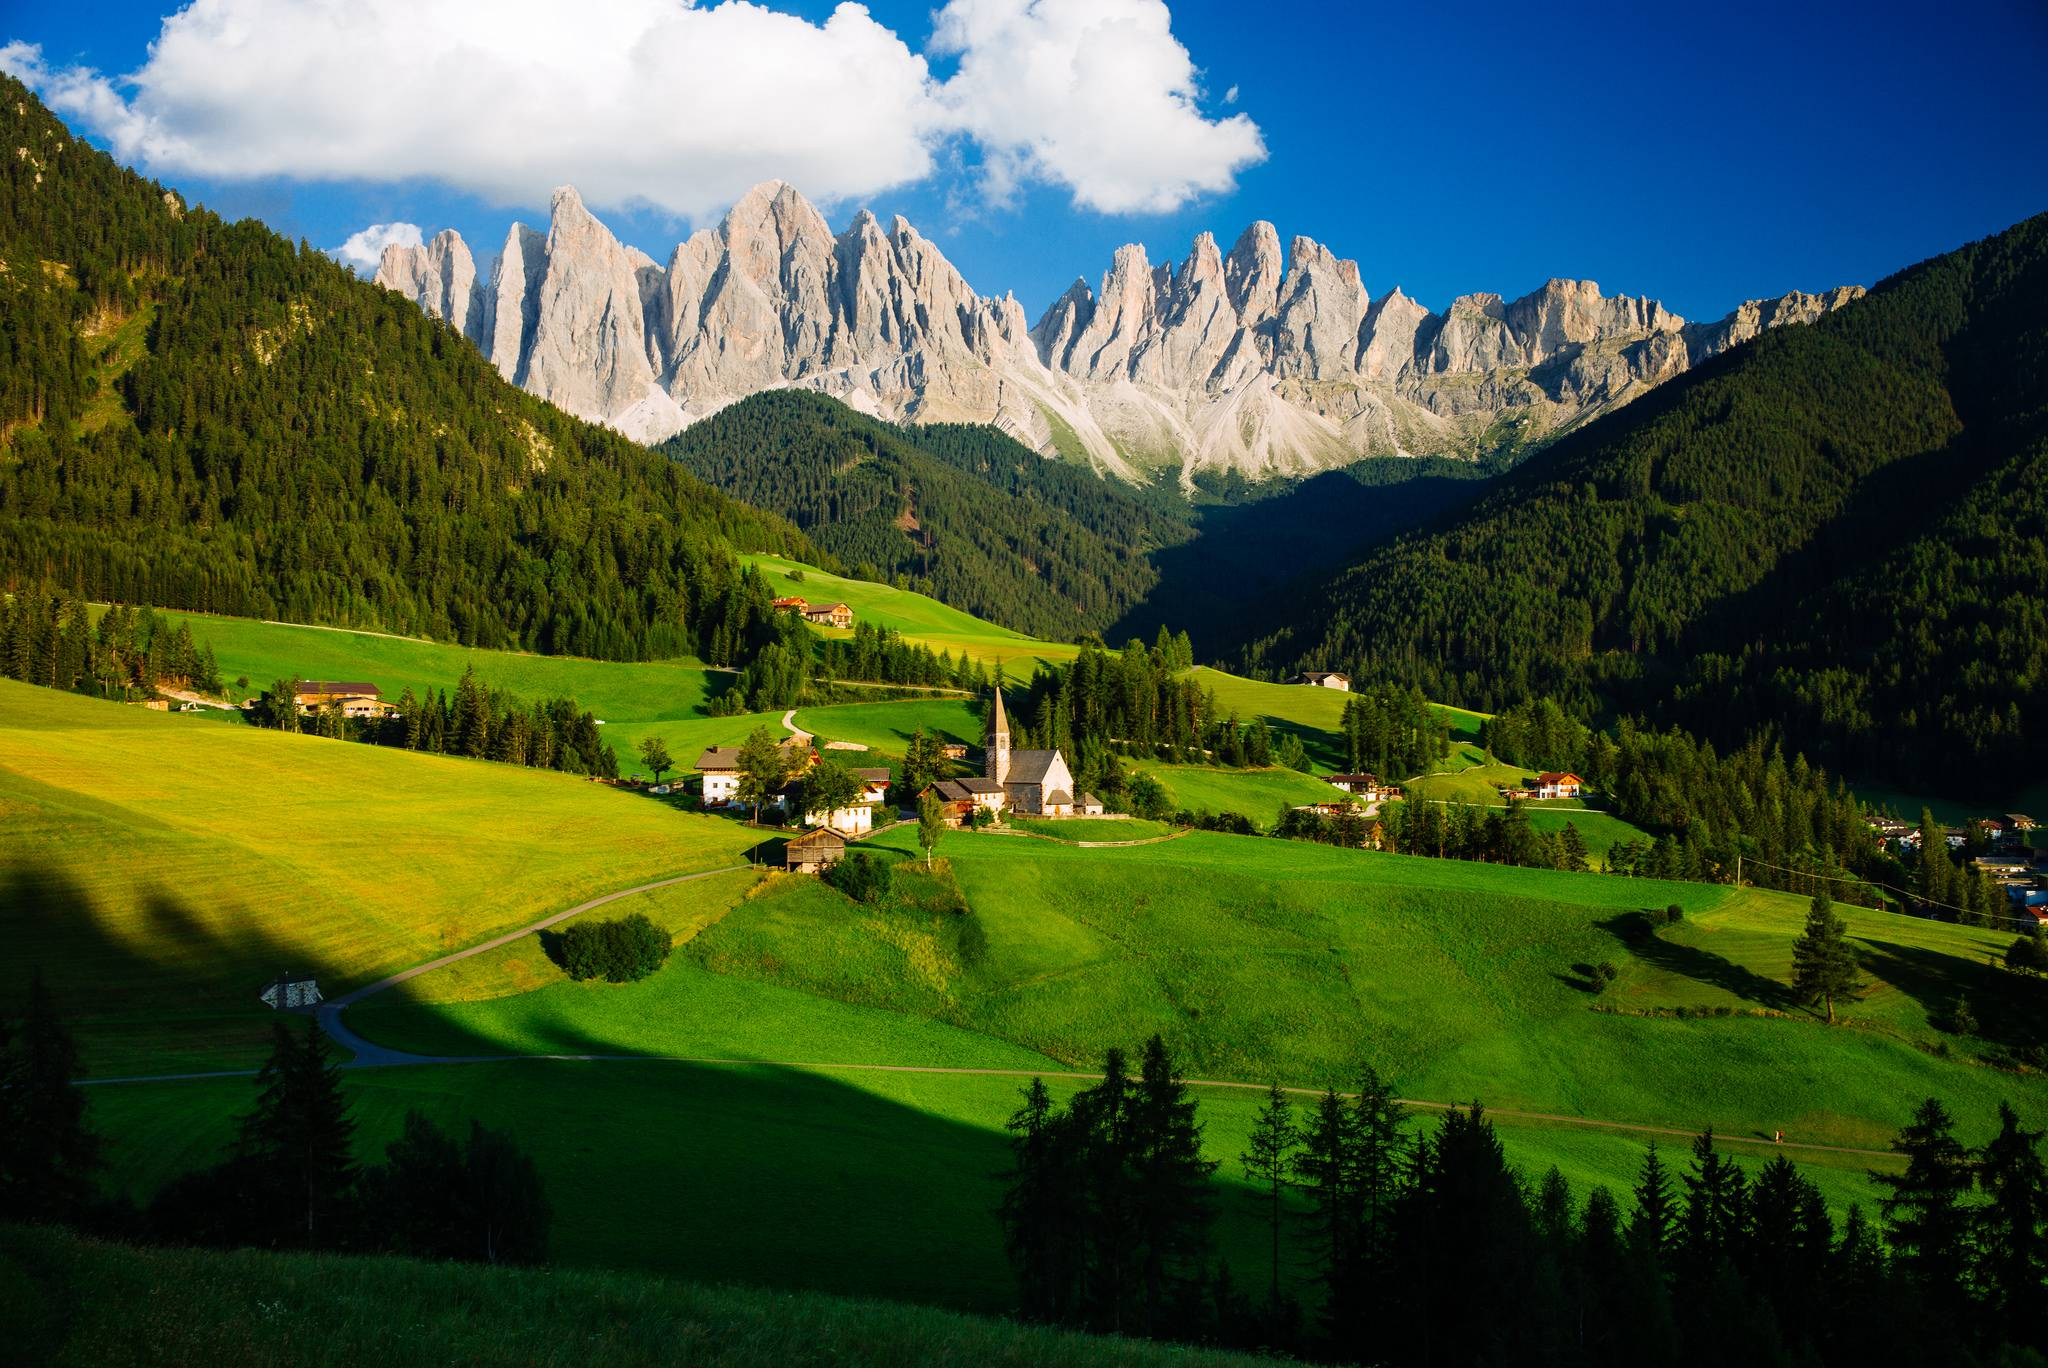 обои Доломиты, Альпы, Италия, The St Johann Church in the Dolomites of Italy картинки фото